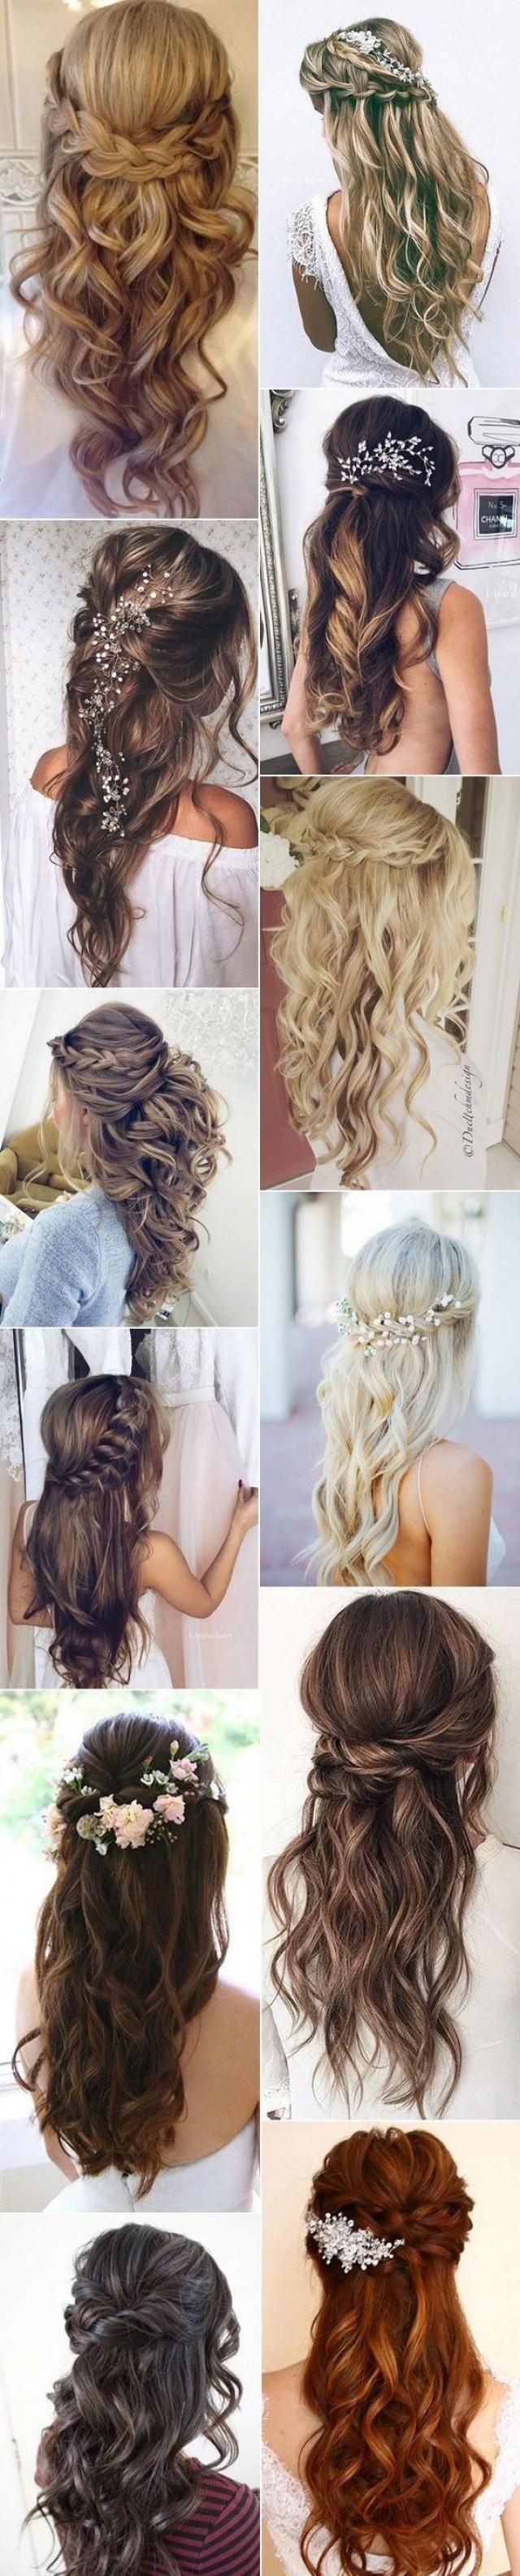 Best 25+ Sweet 16 hairstyles ideas on Pinterest ...